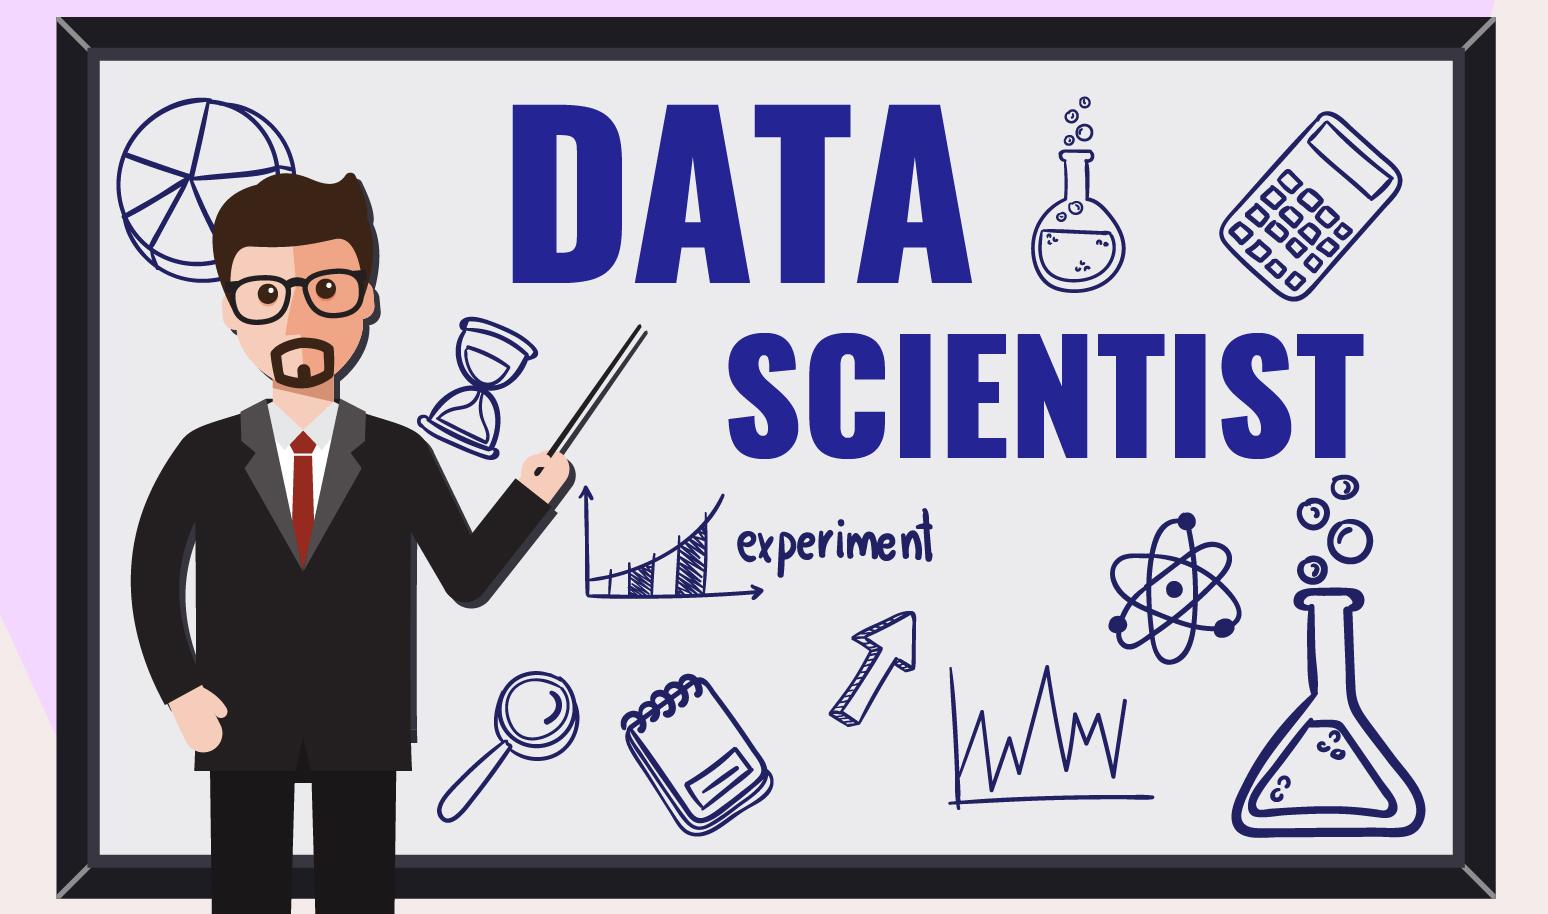 Кто такой data scientist